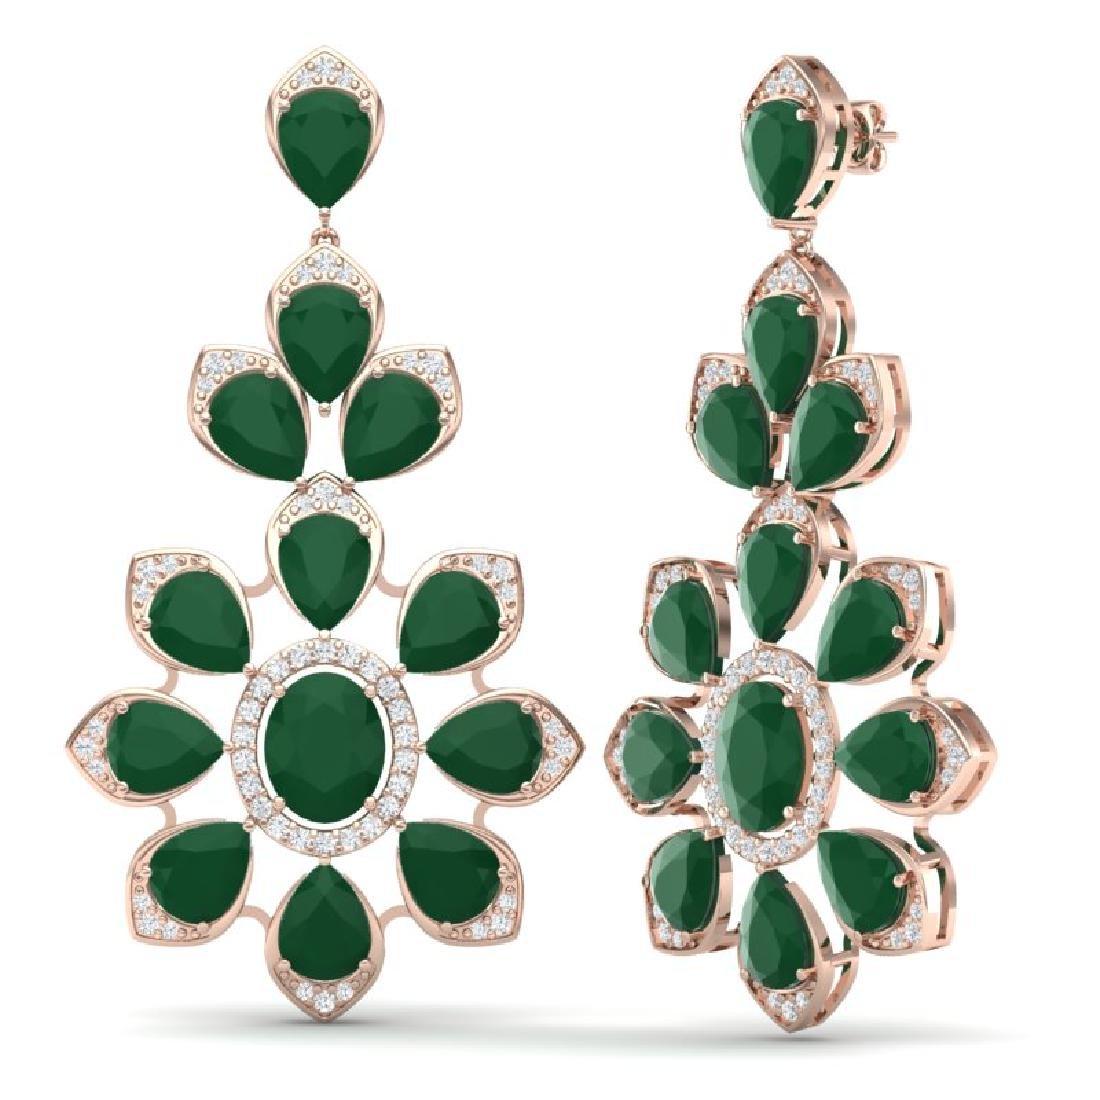 51.8 CTW Royalty Emerald & VS Diamond Earrings 18K Rose - 3